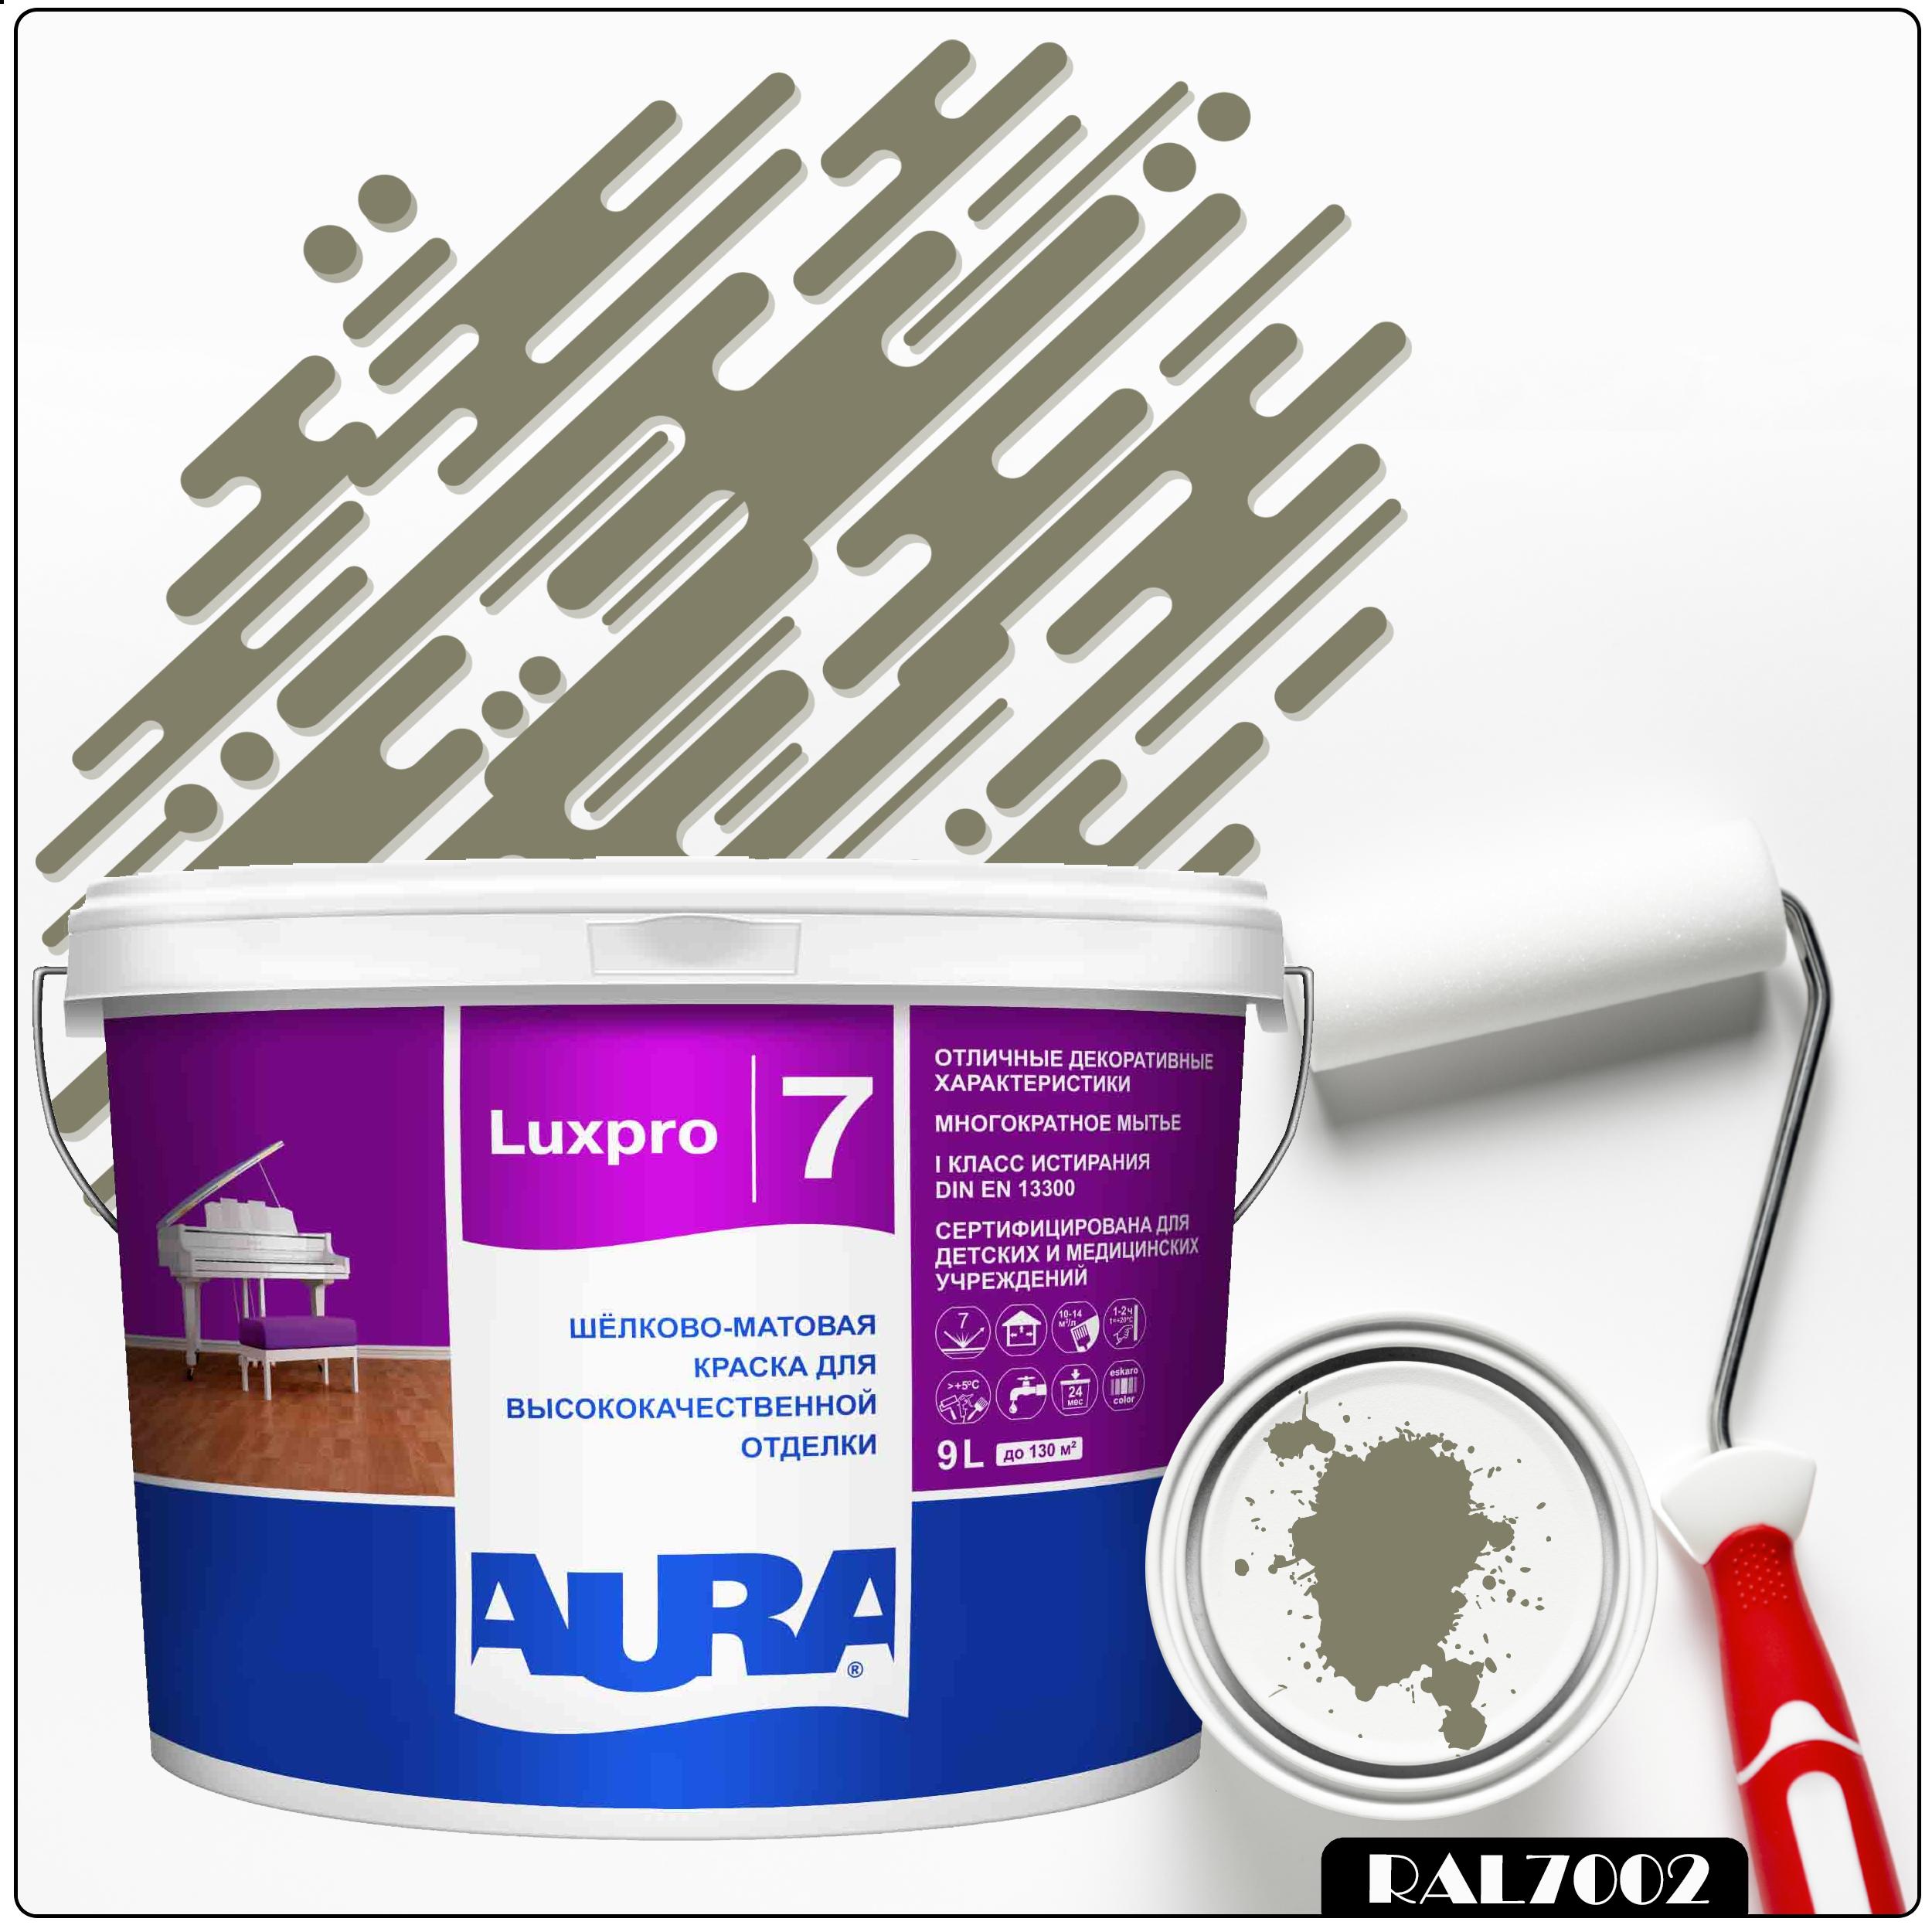 Фото 3 - Краска Aura LuxPRO 7, RAL 7002 Оливково-серый, латексная, шелково-матовая, интерьерная, 9л, Аура.